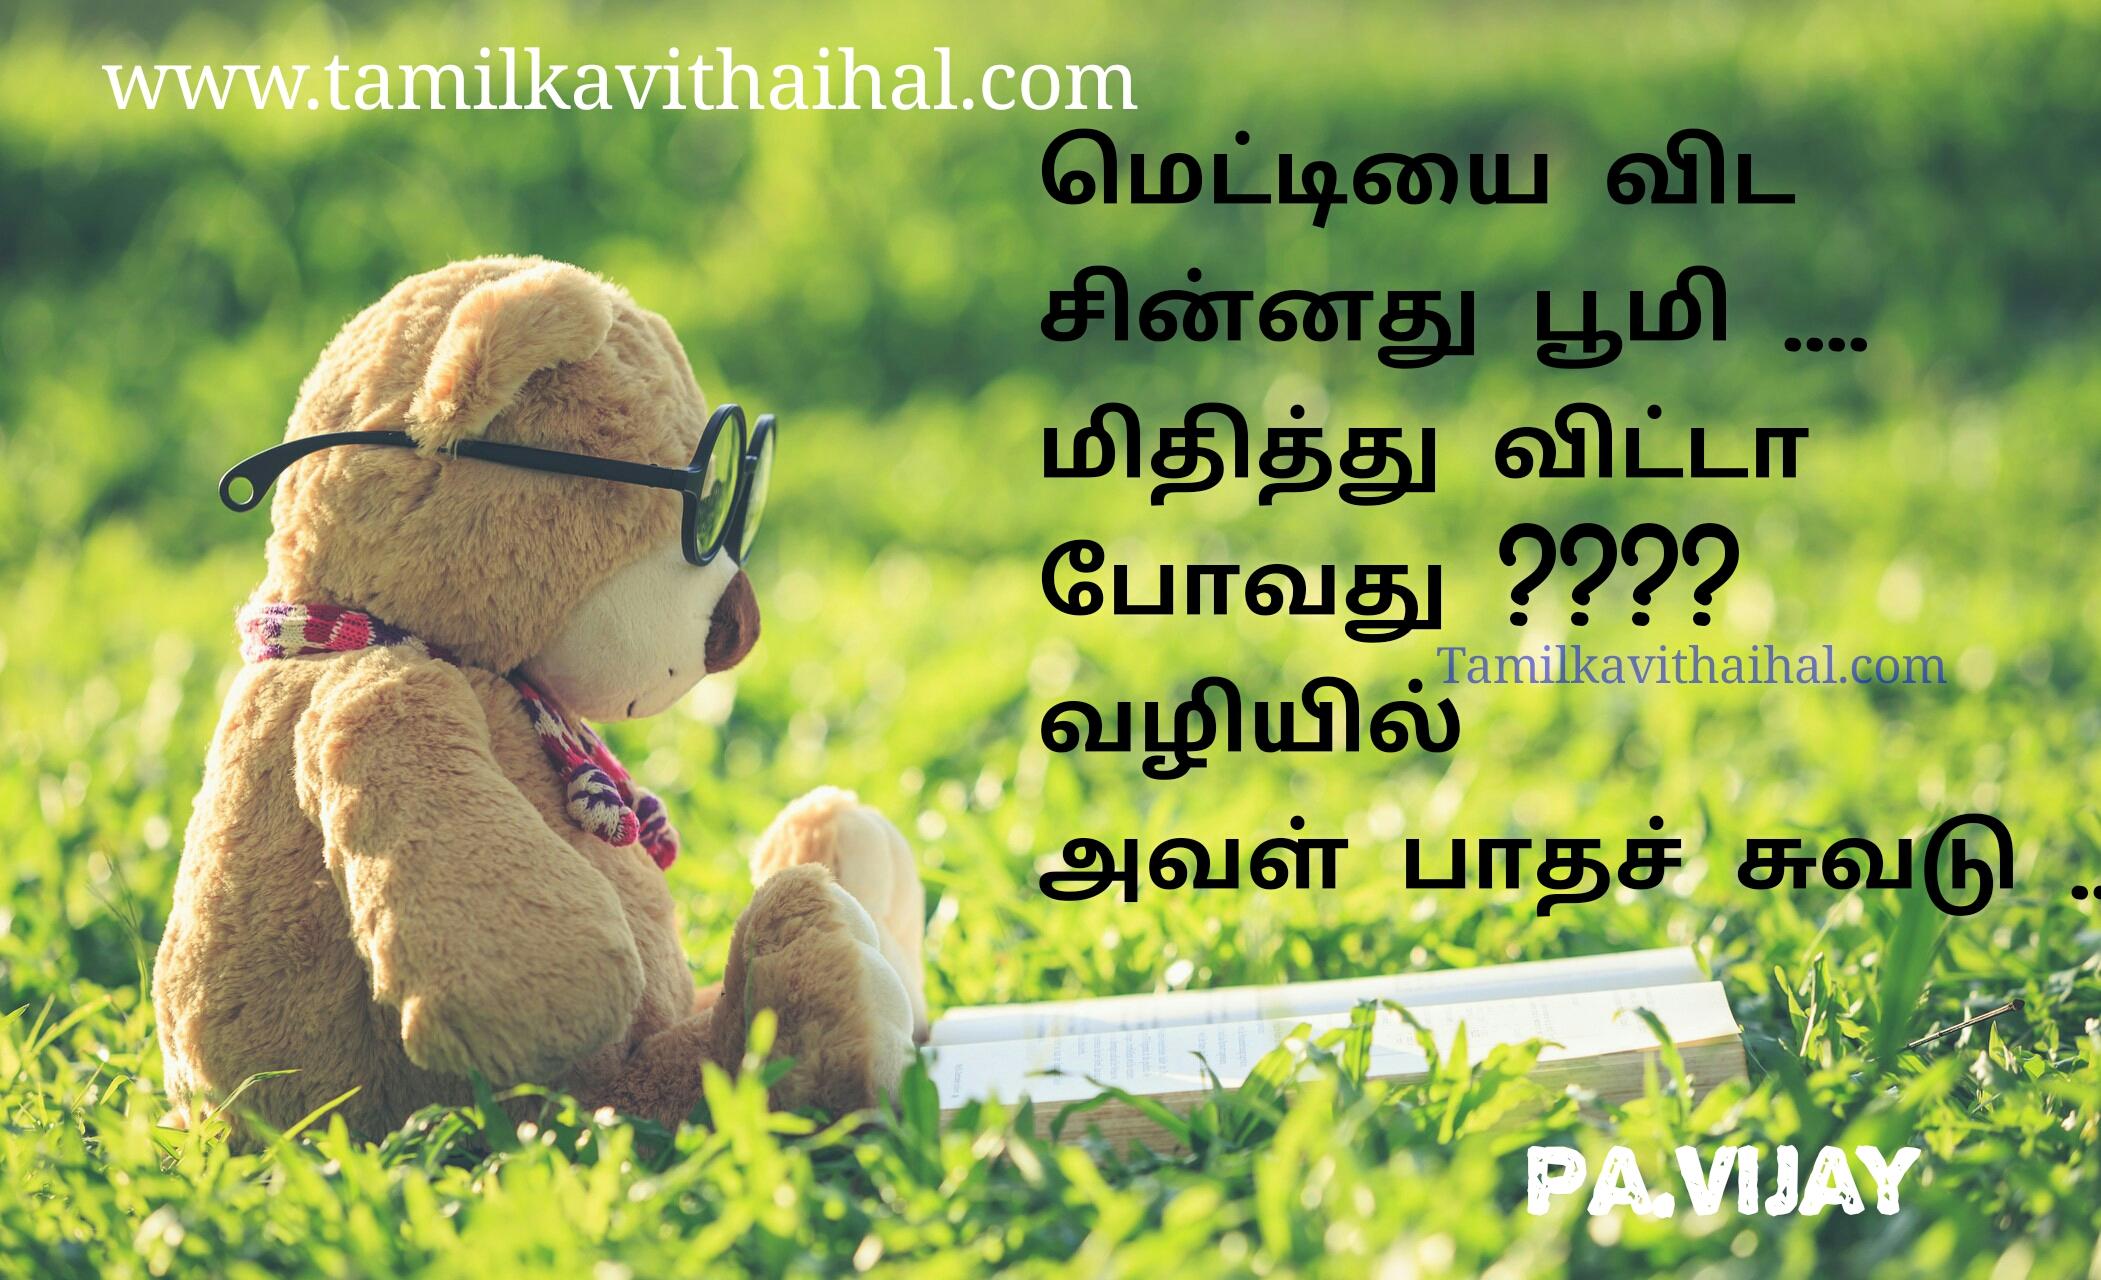 Cute love kadhal kavithai pa vijay image boomi aval pathasuvadu quotes